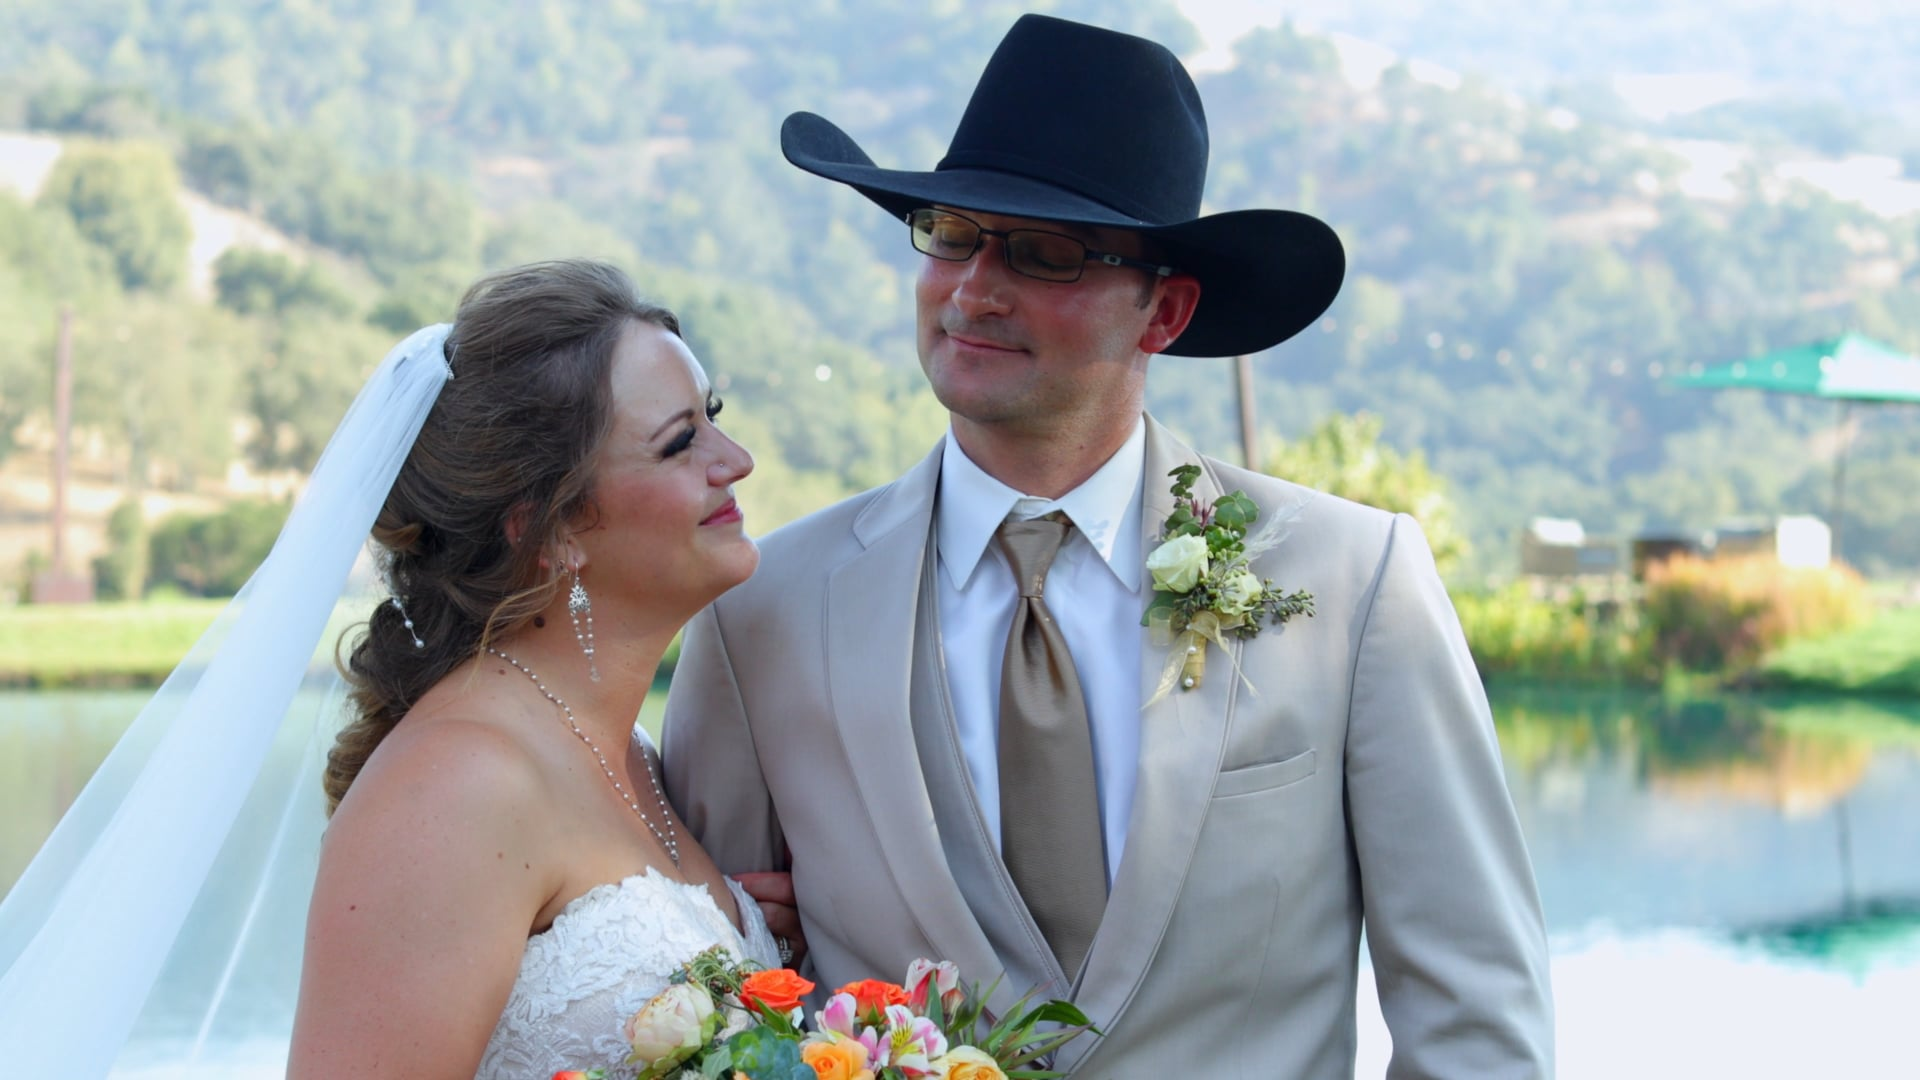 Megan & Jeremy Wedding Teaser